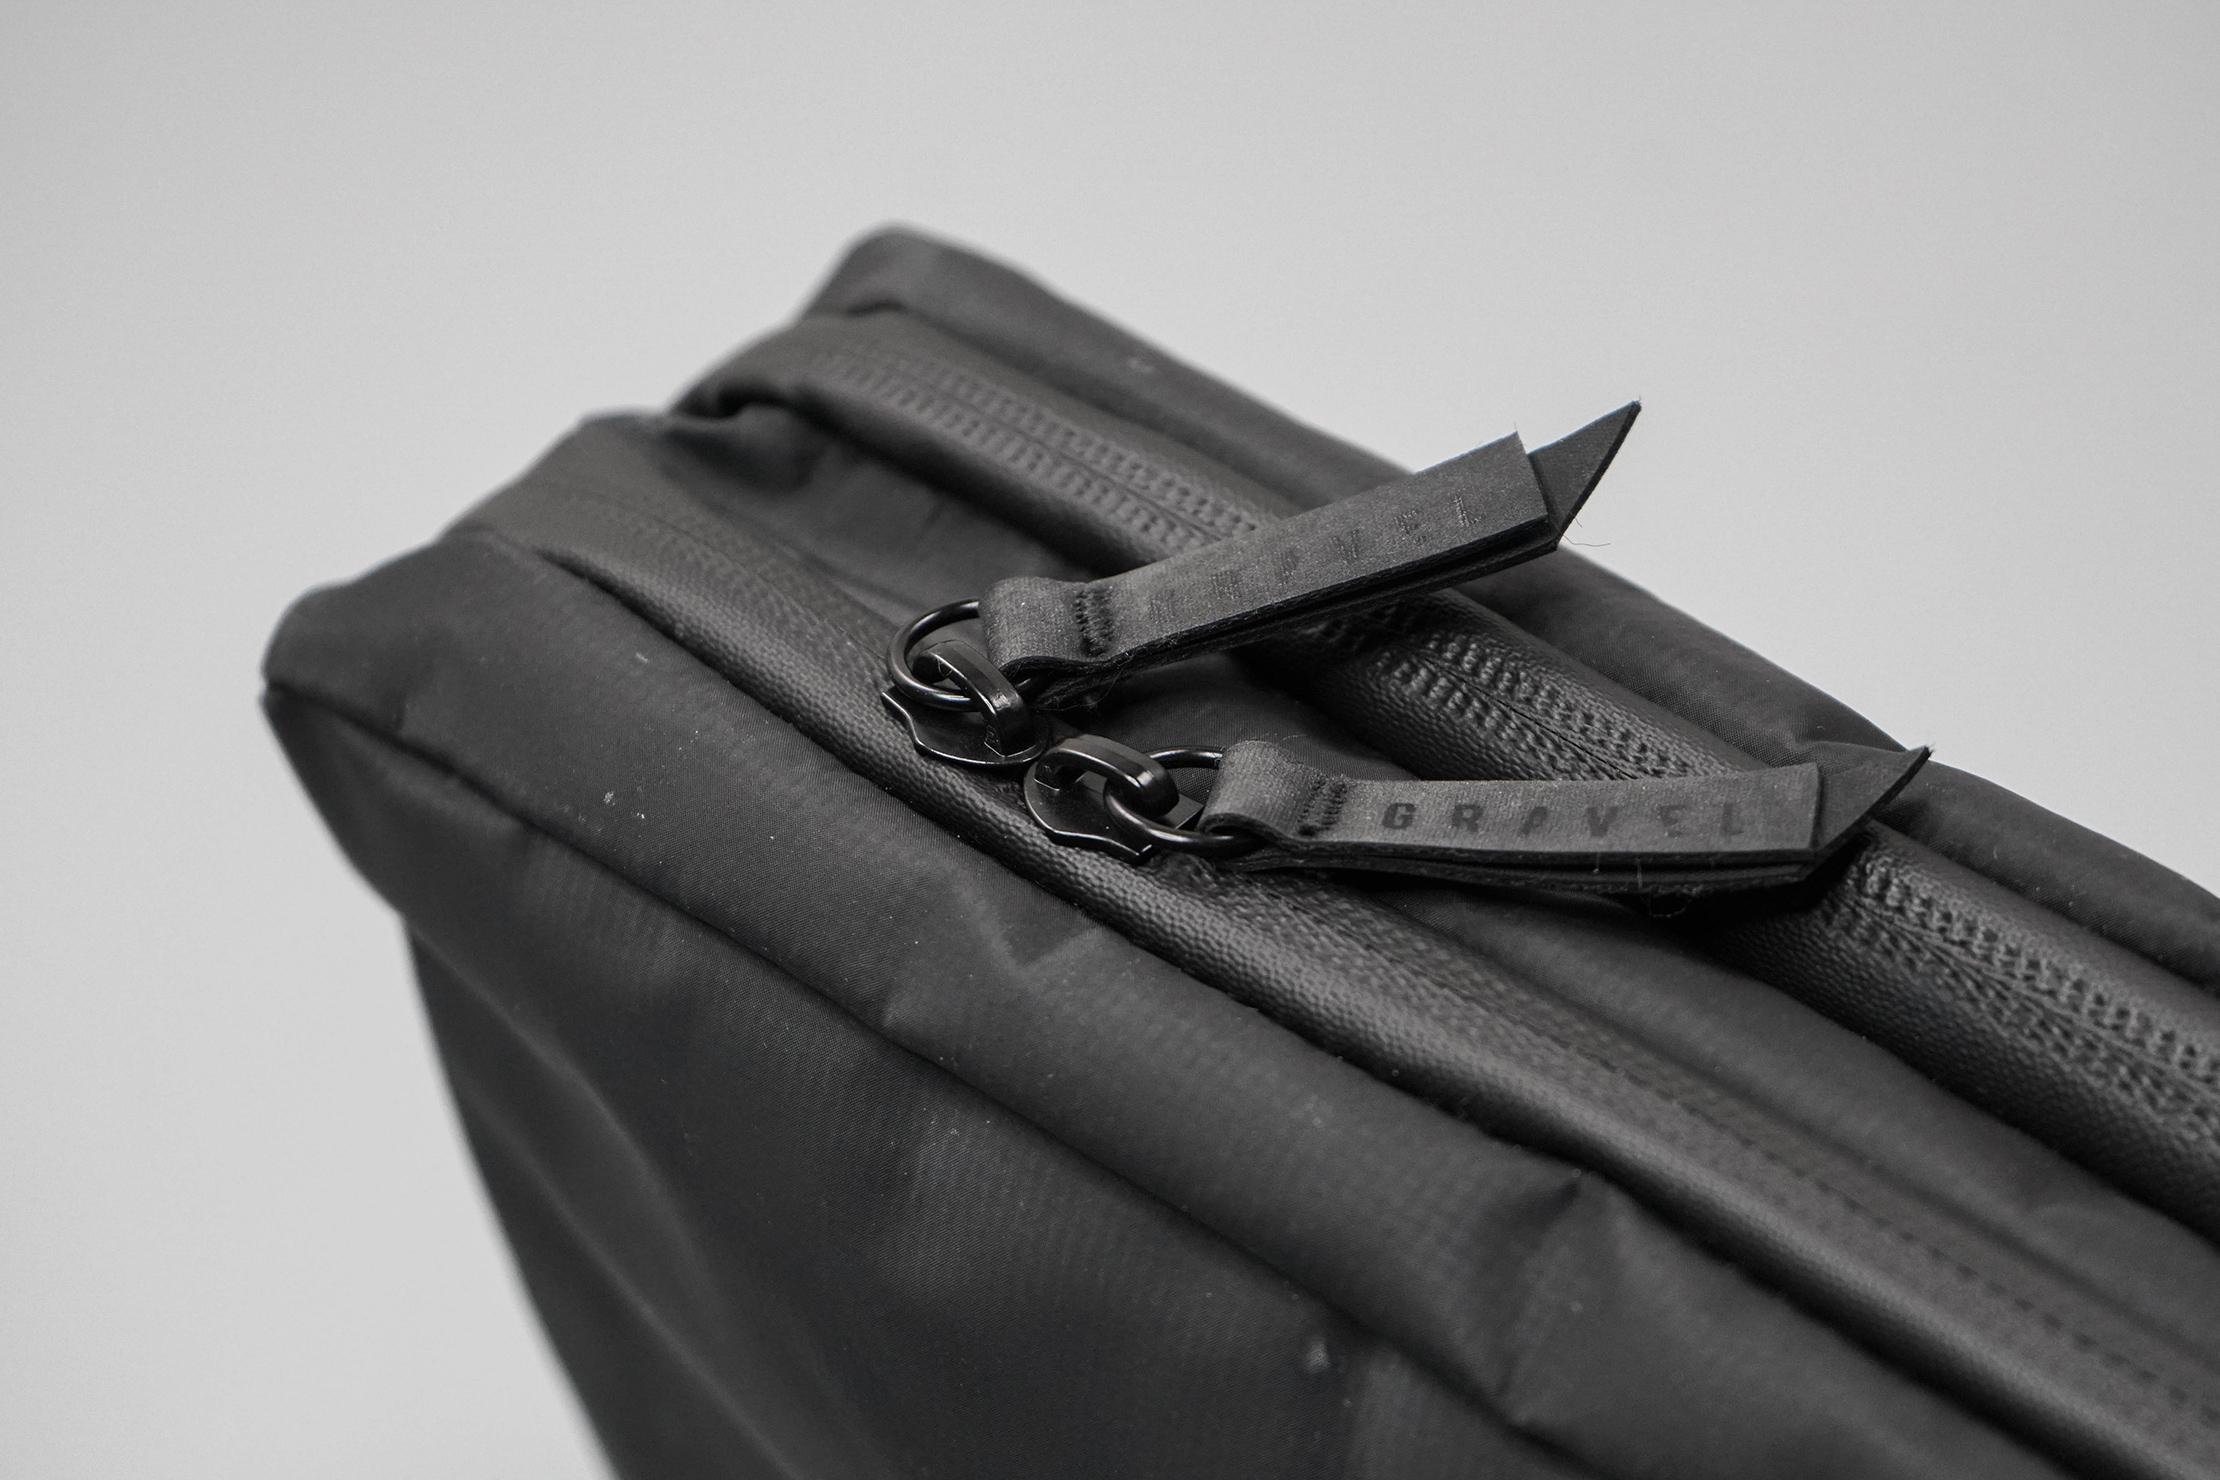 Gravel Explorer Plus Toiletry Bag Zipper